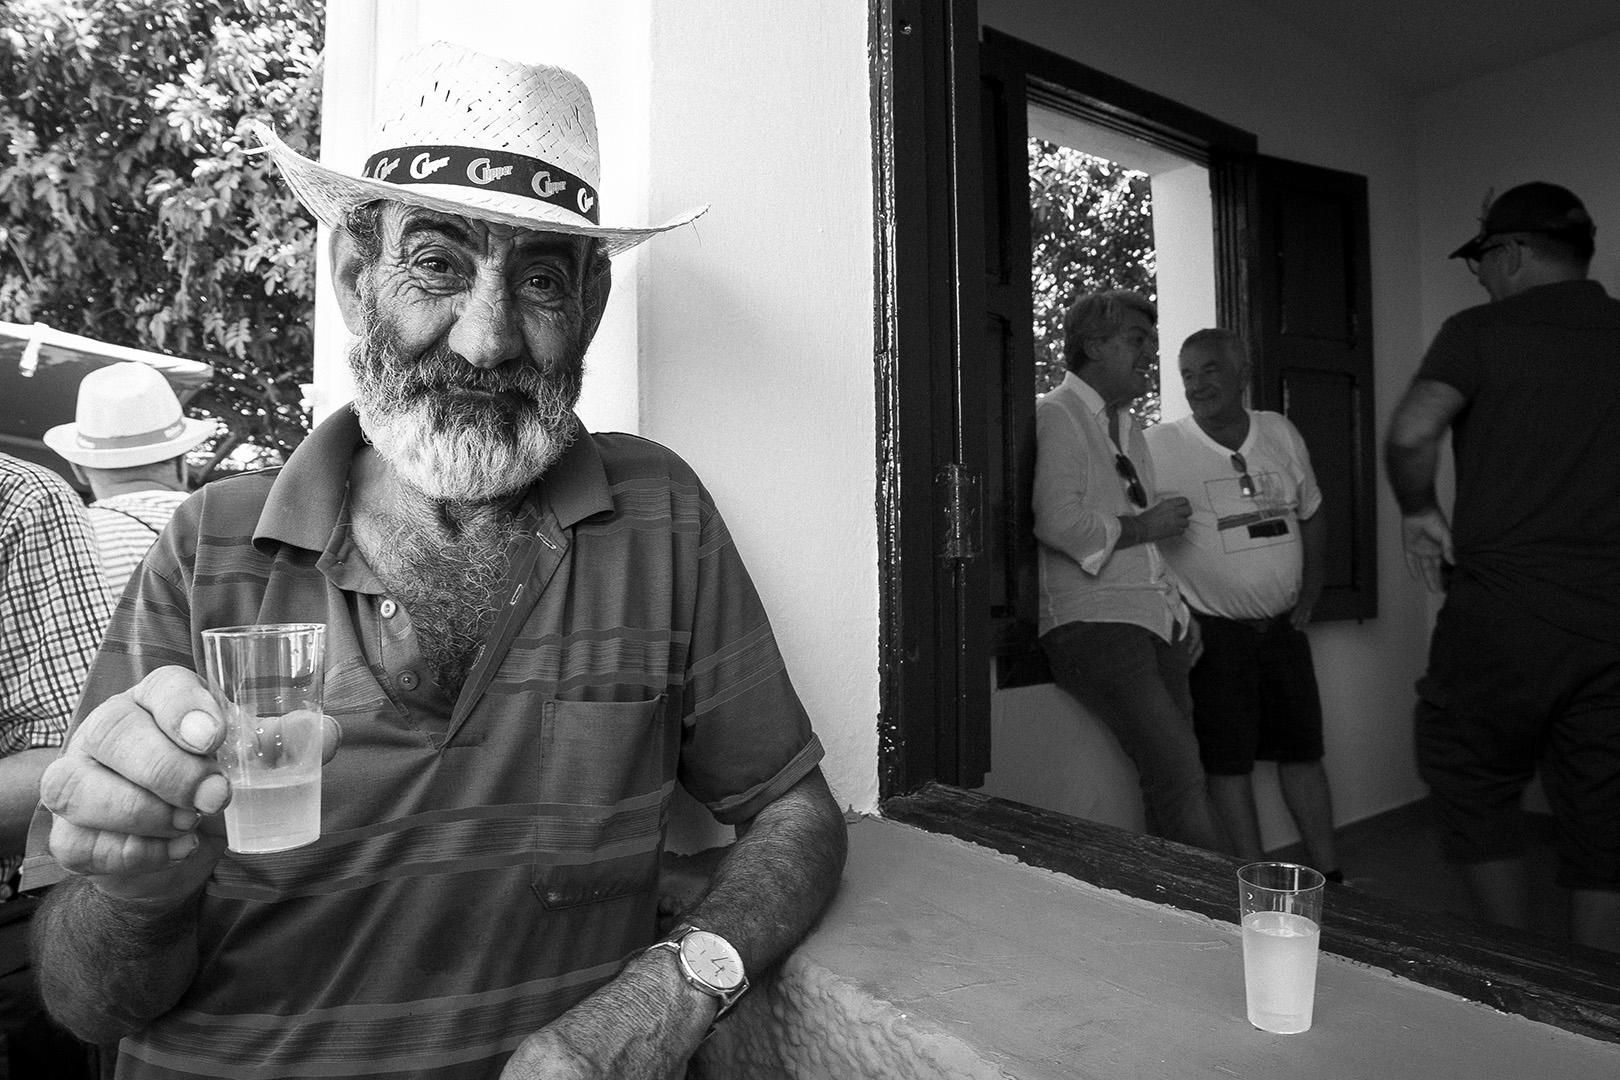 Romeria, Guimar - Socorro; A toast